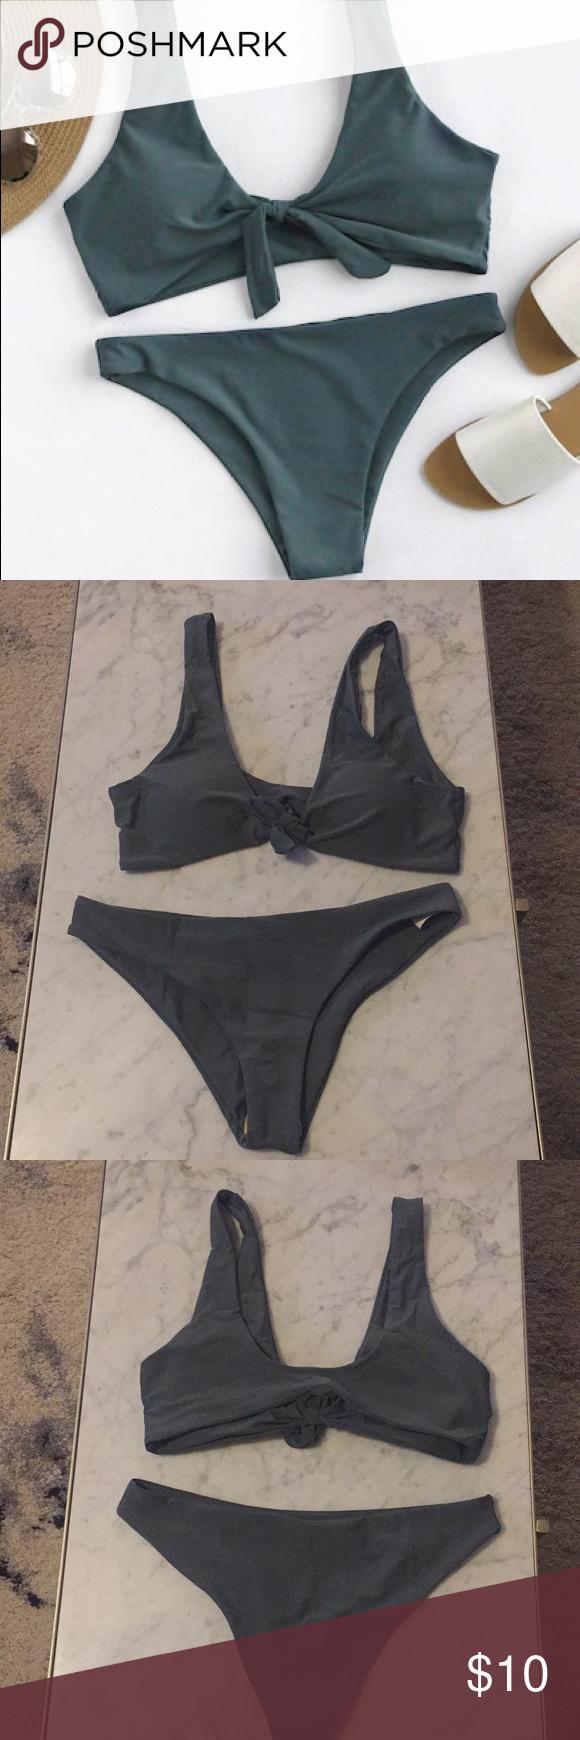 d321eae034 Army Green front knit bathing suit Brand new front knot two piece bikini  SHEIN Swim Bikinis